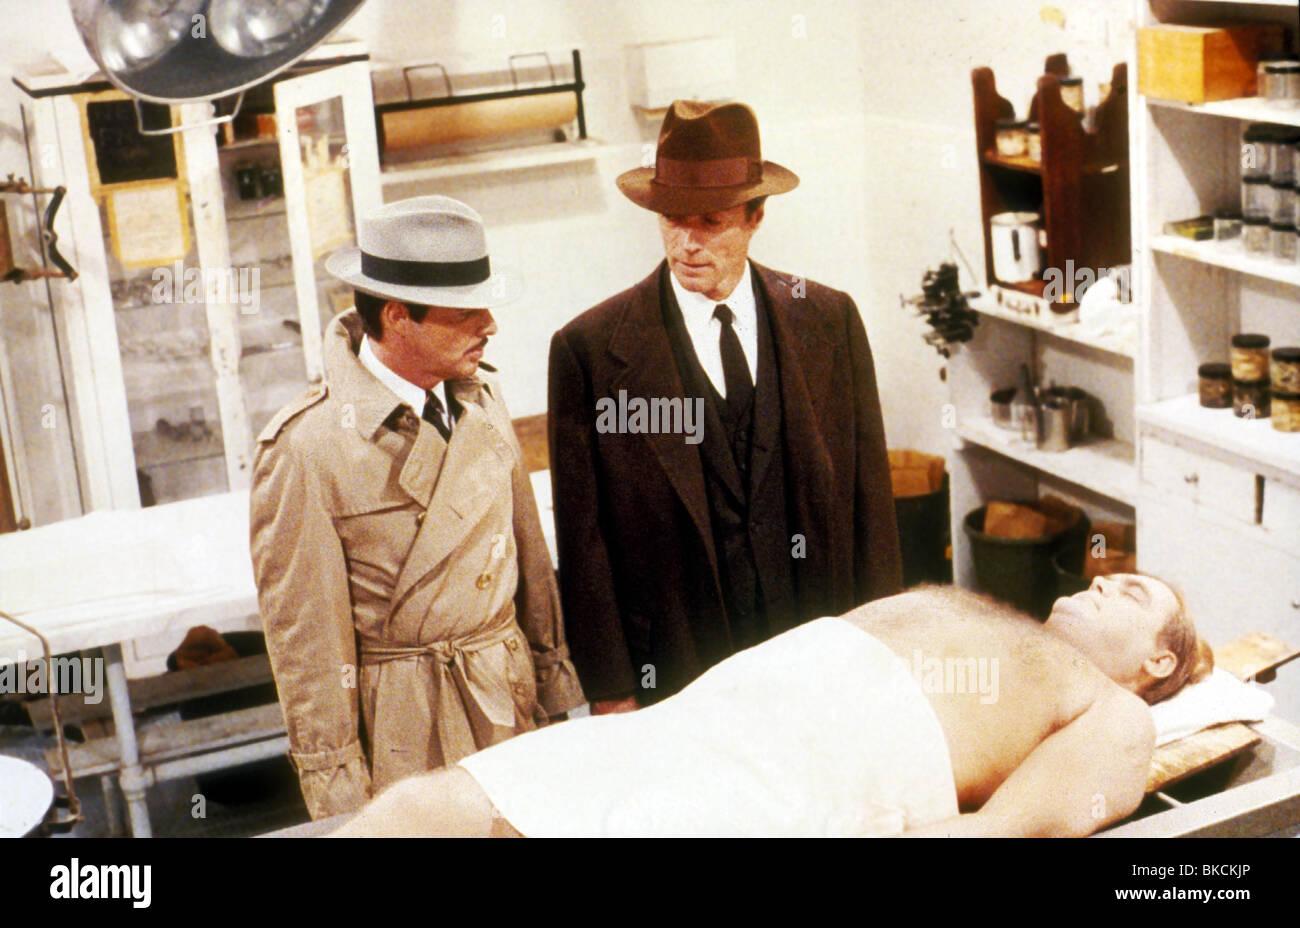 CITY HEAT (1984) BURT REYNOLDS, CLINT EASTWOOD CIH 024 - Stock Image